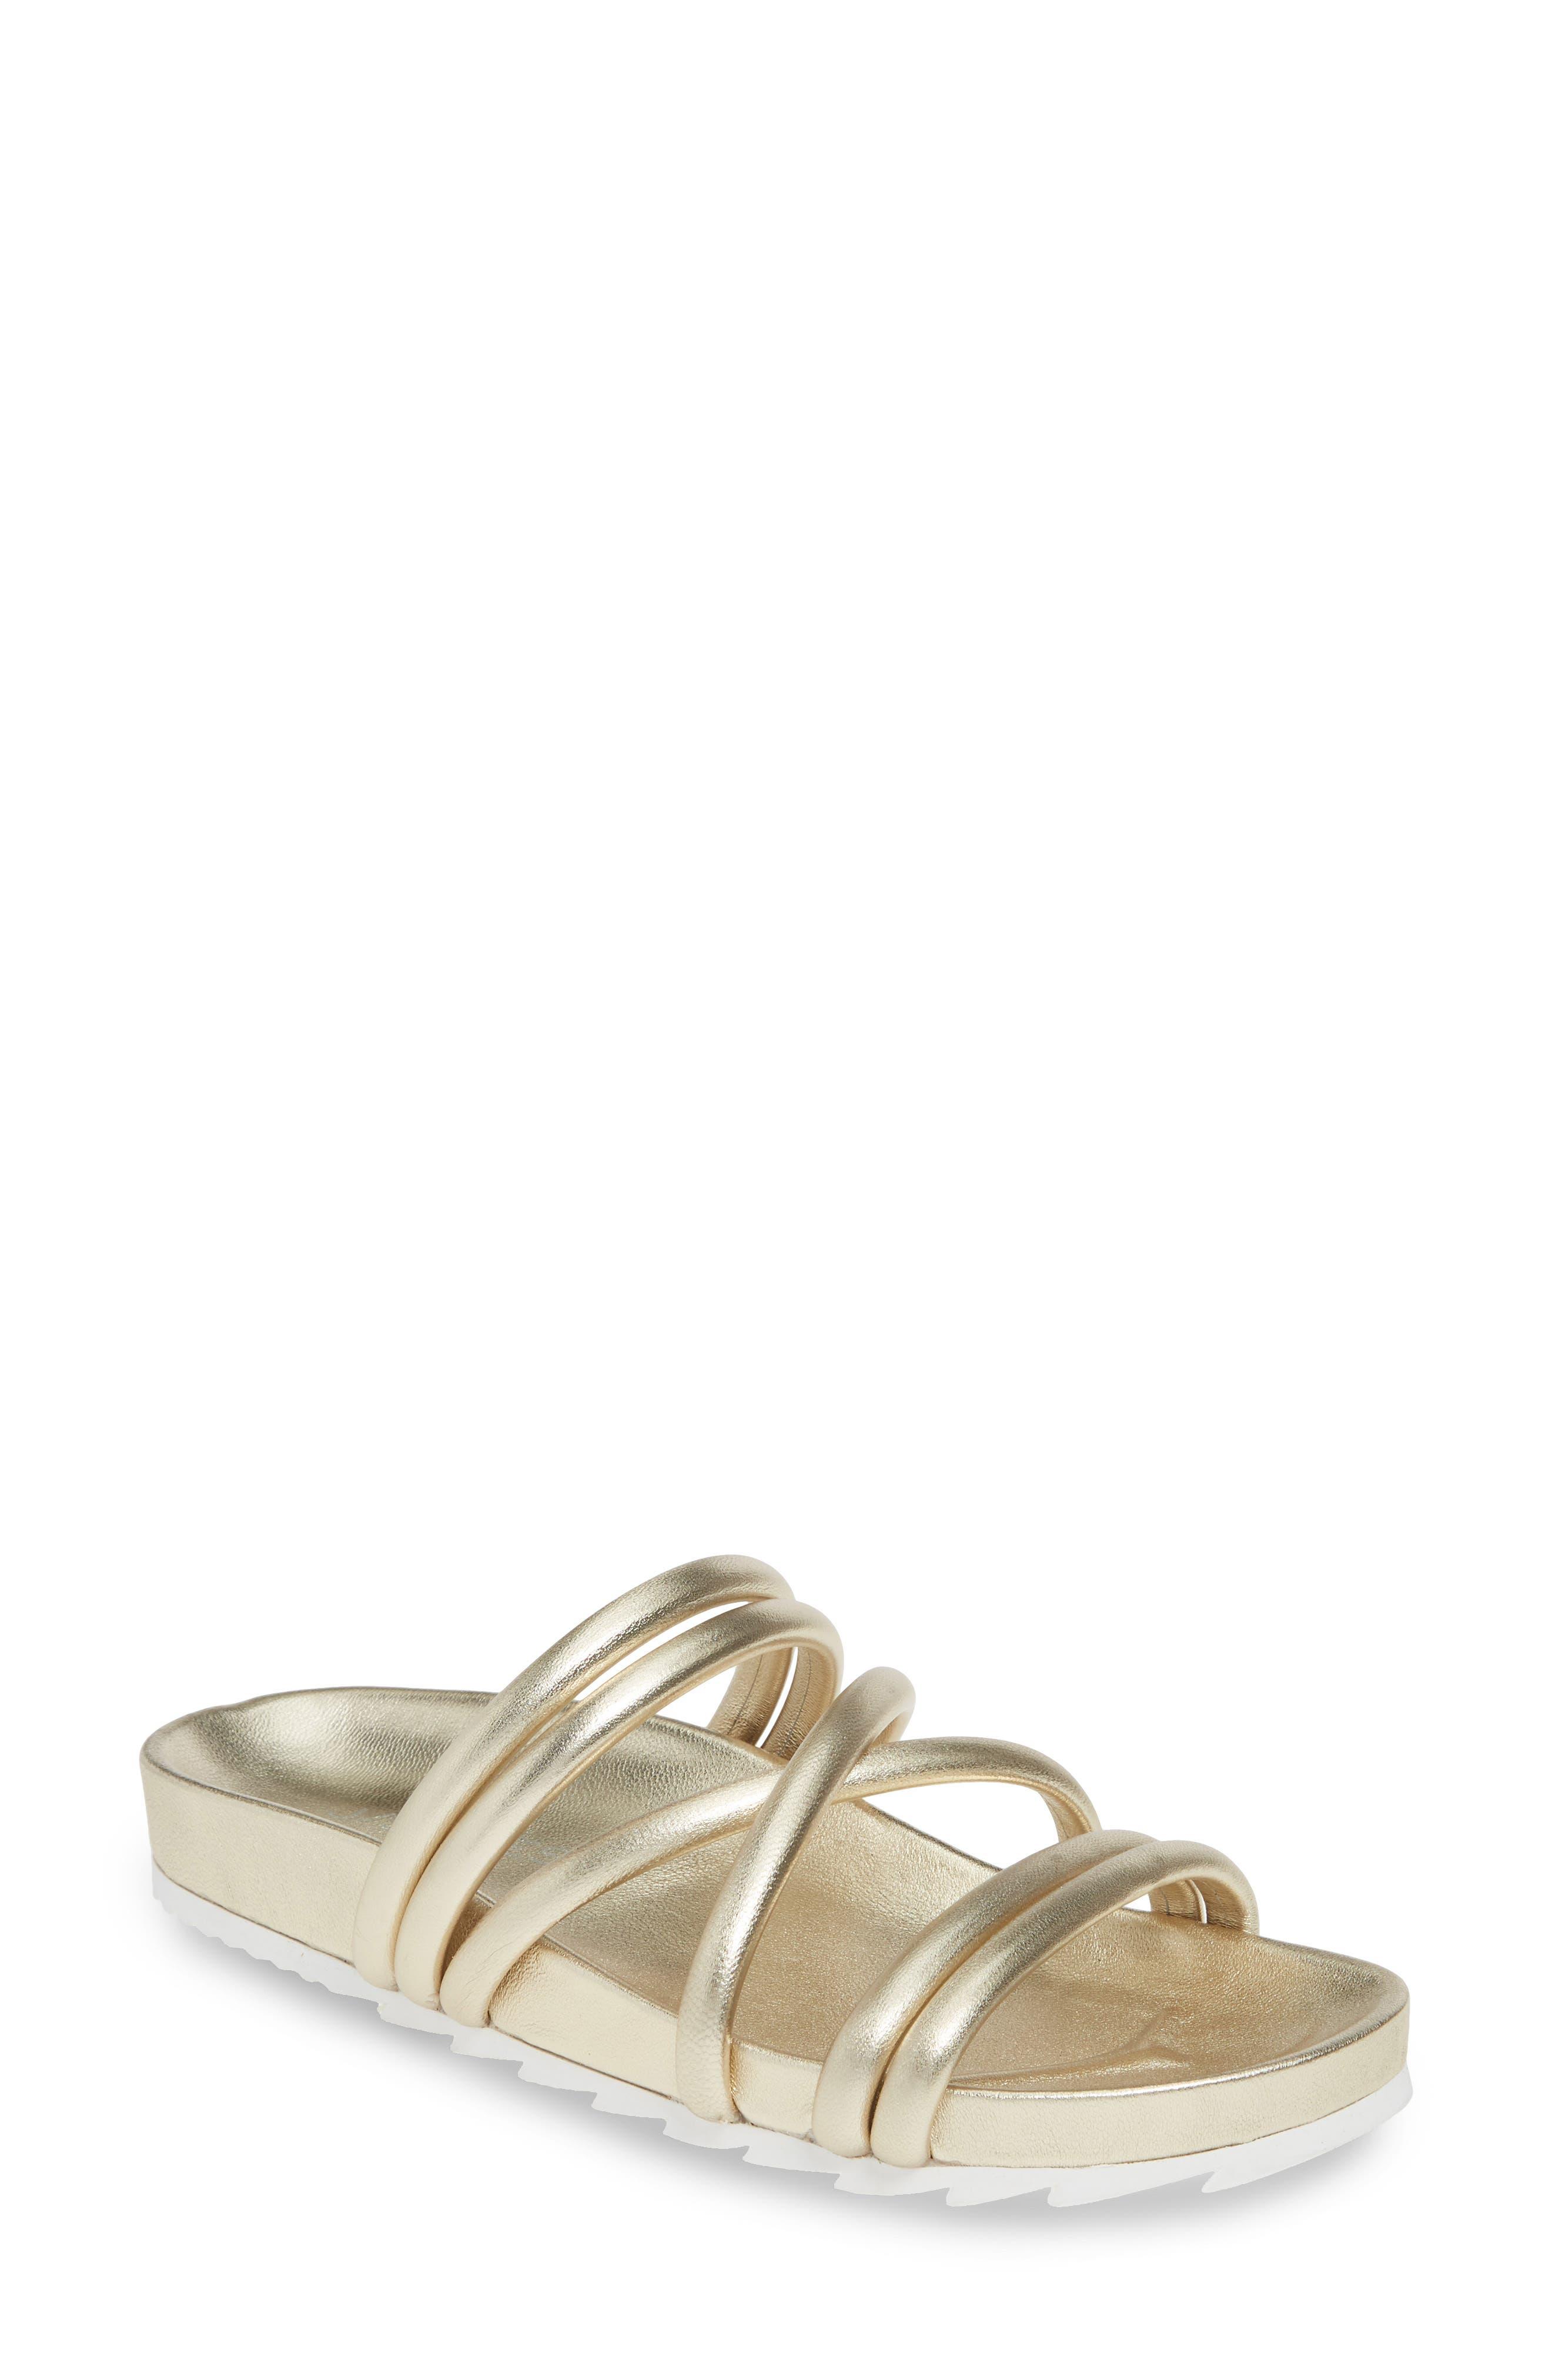 Jslides Tess Strappy Slide Sandal, Metallic